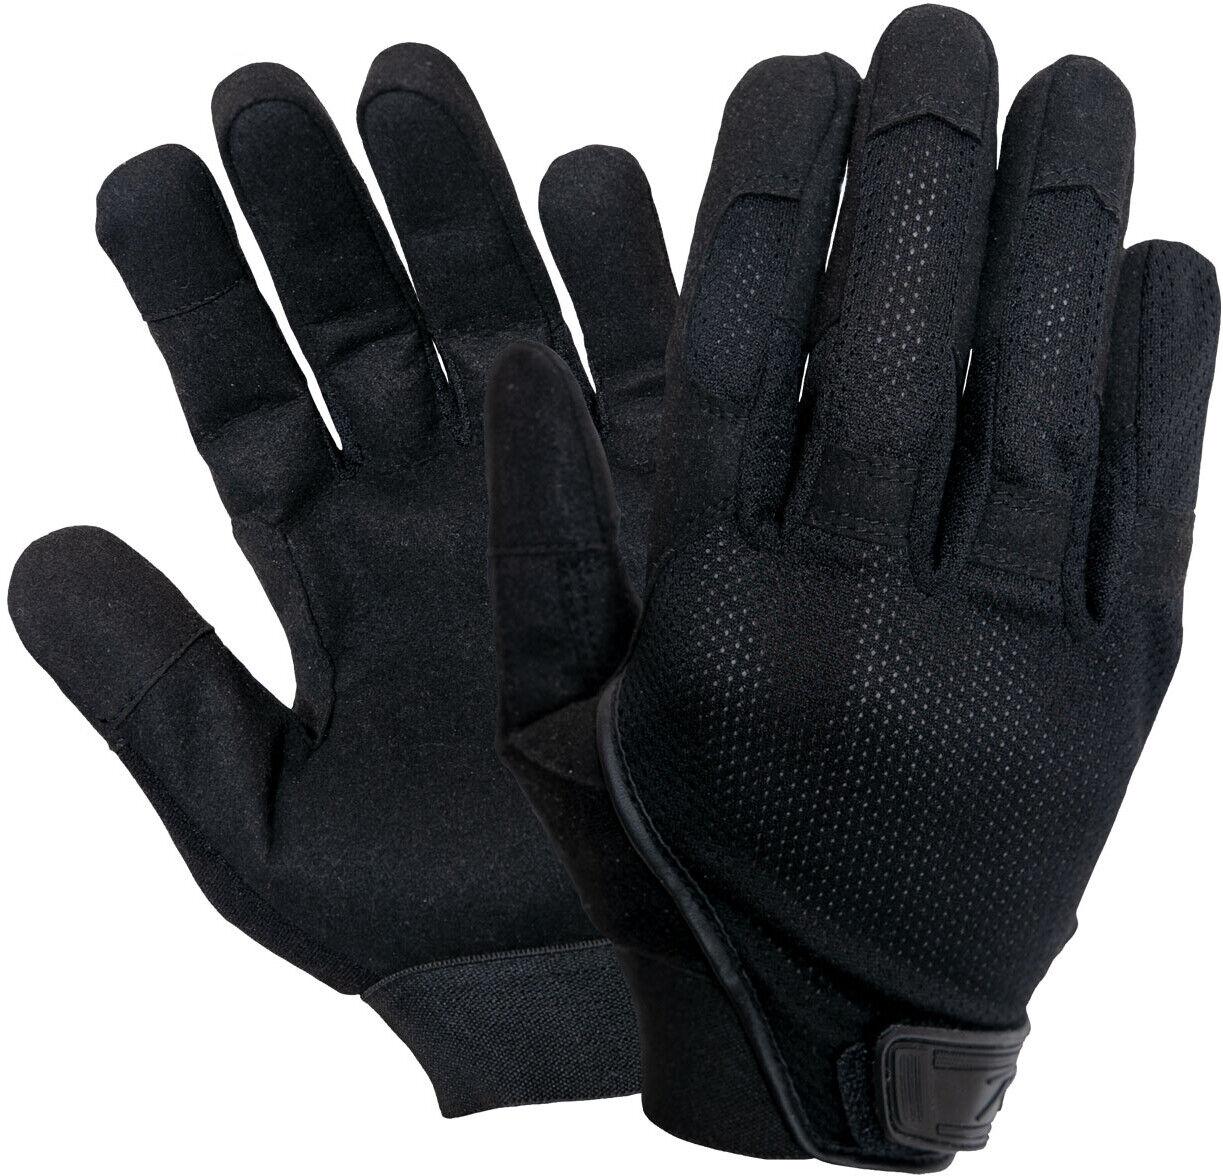 Black All Purpose Touch Screen Lightweight Mesh Tactical Combat Glove